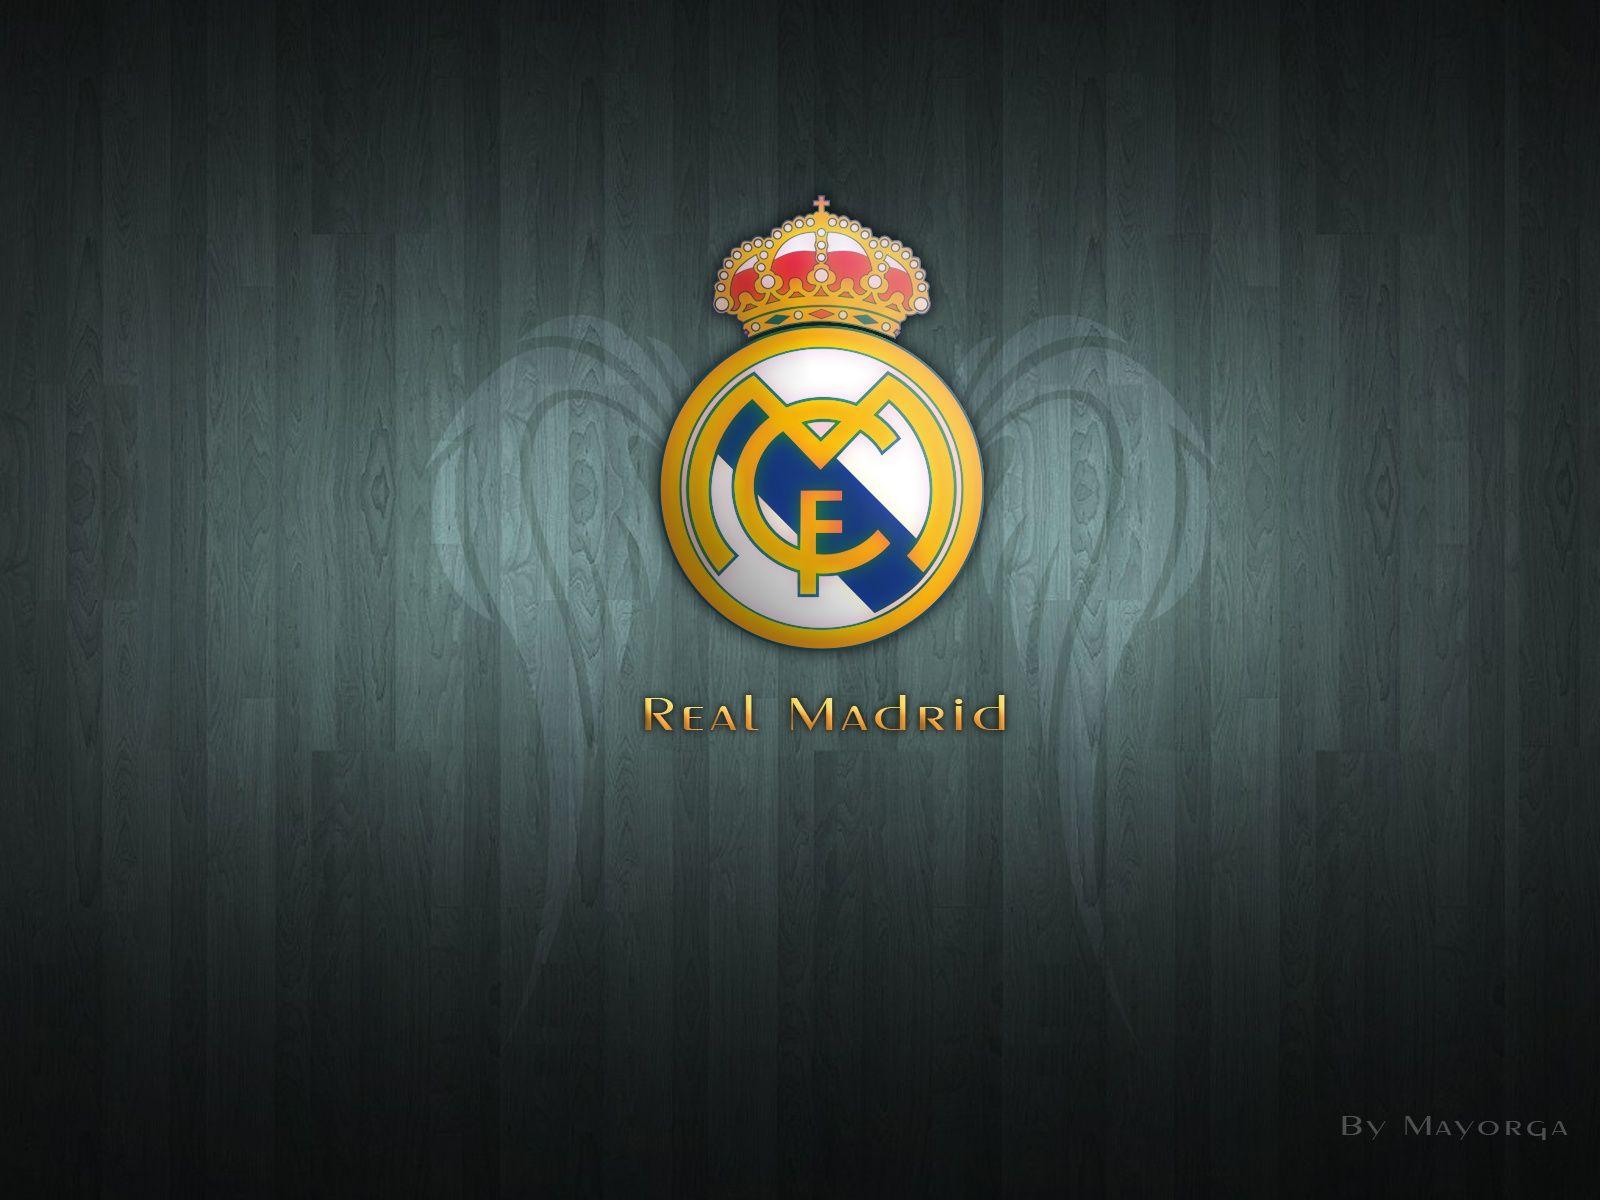 Wallpaper real madrid for windows xp - New Real Madrid Logo Hd Wallpaper